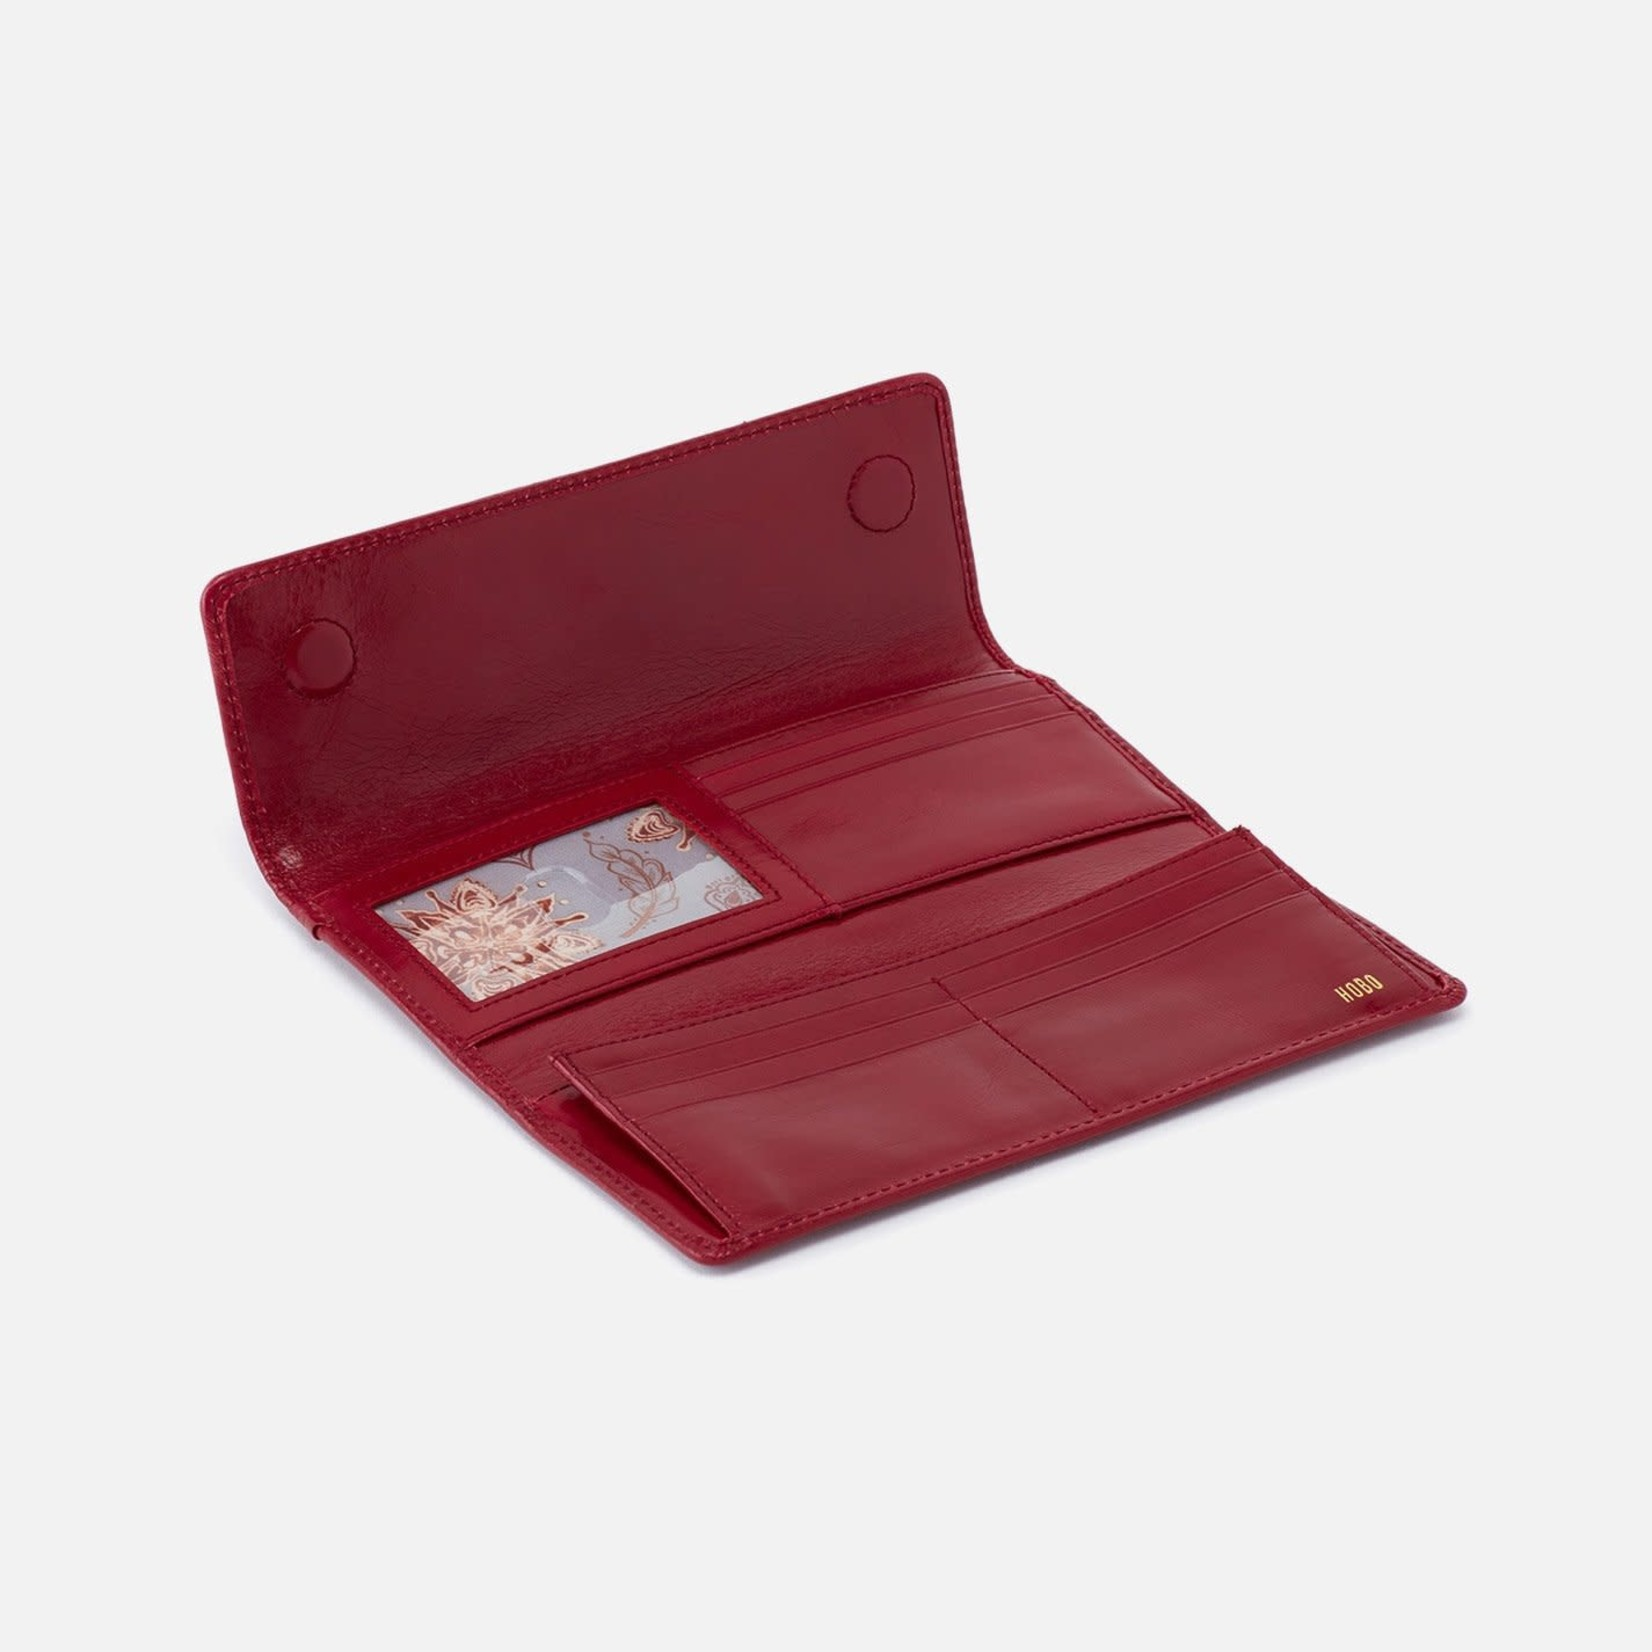 HOBO Ardor Cardinal Vintage Hide Leather Continental Wallet